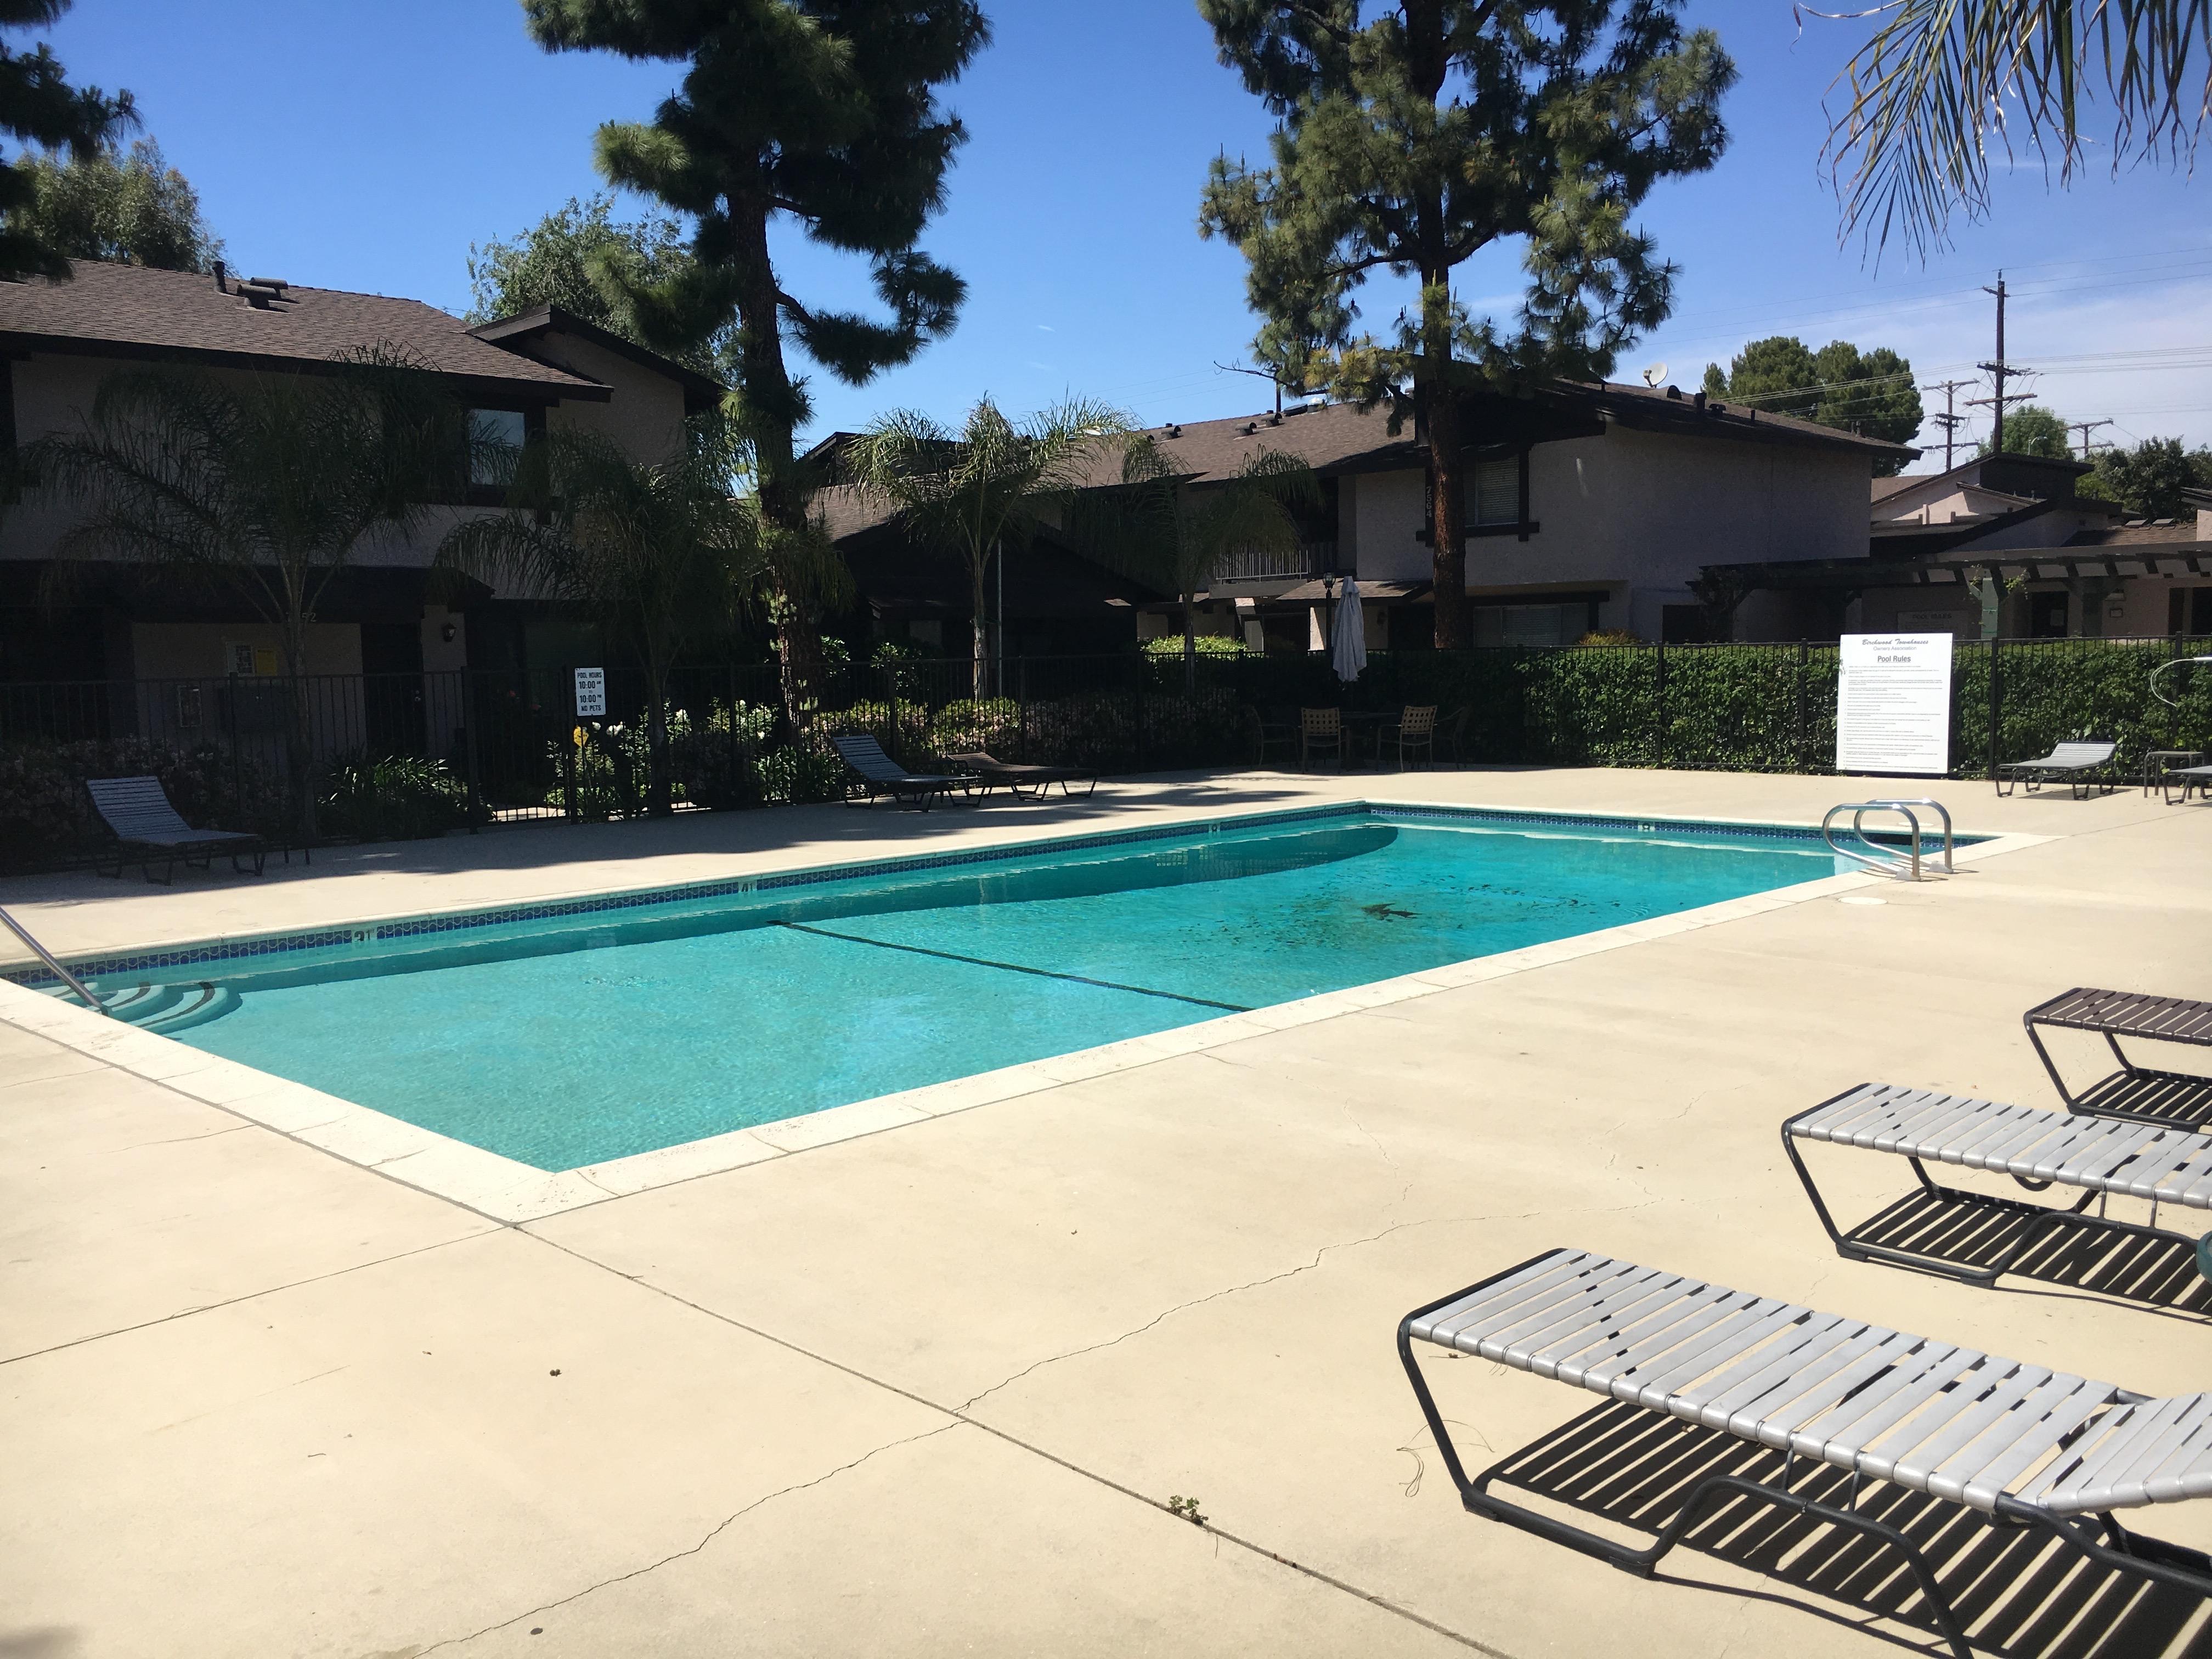 Corbin Pool